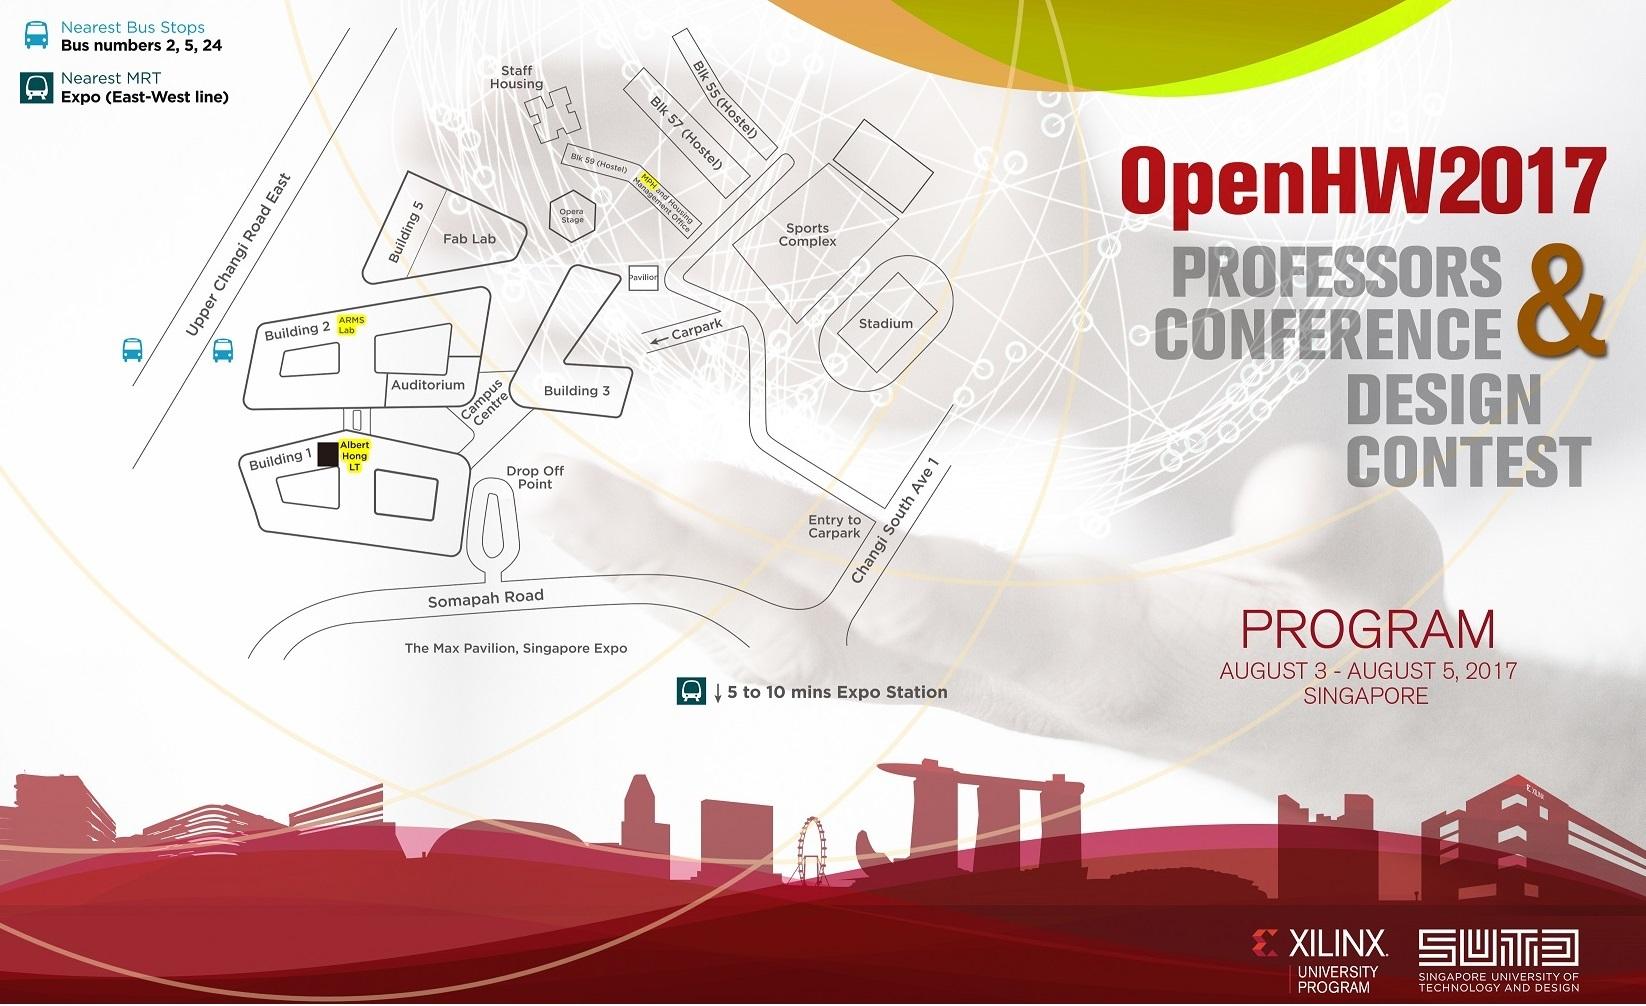 OpenHW2017 Design Contest & Professors Conference